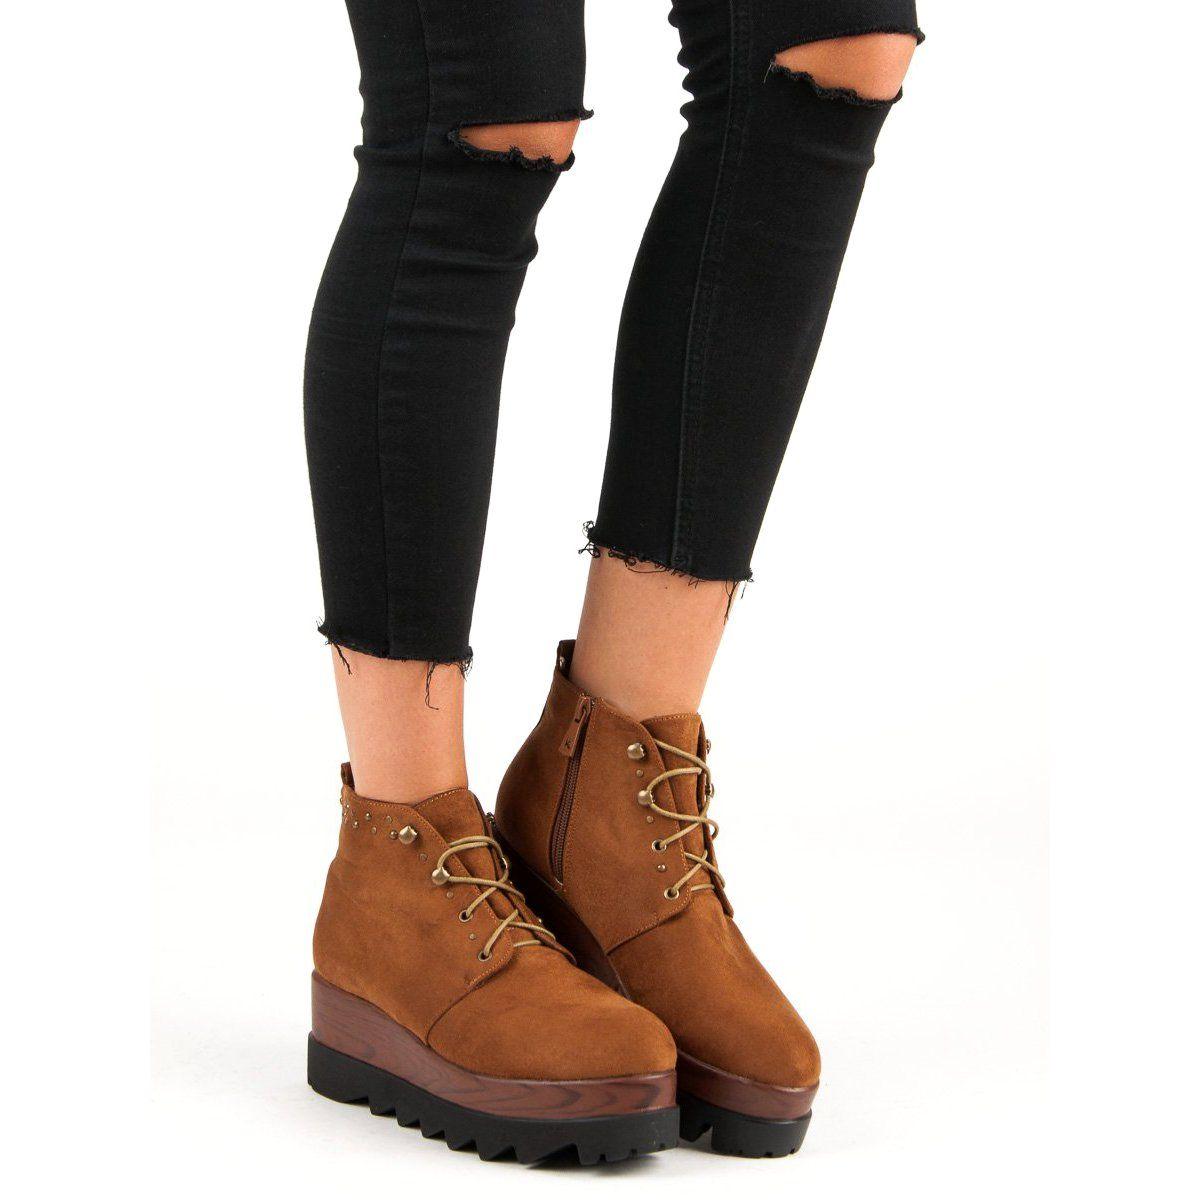 Kylie Zamszowe Botki Na Koturnie Brazowe Timberland Boots Shoes Boots